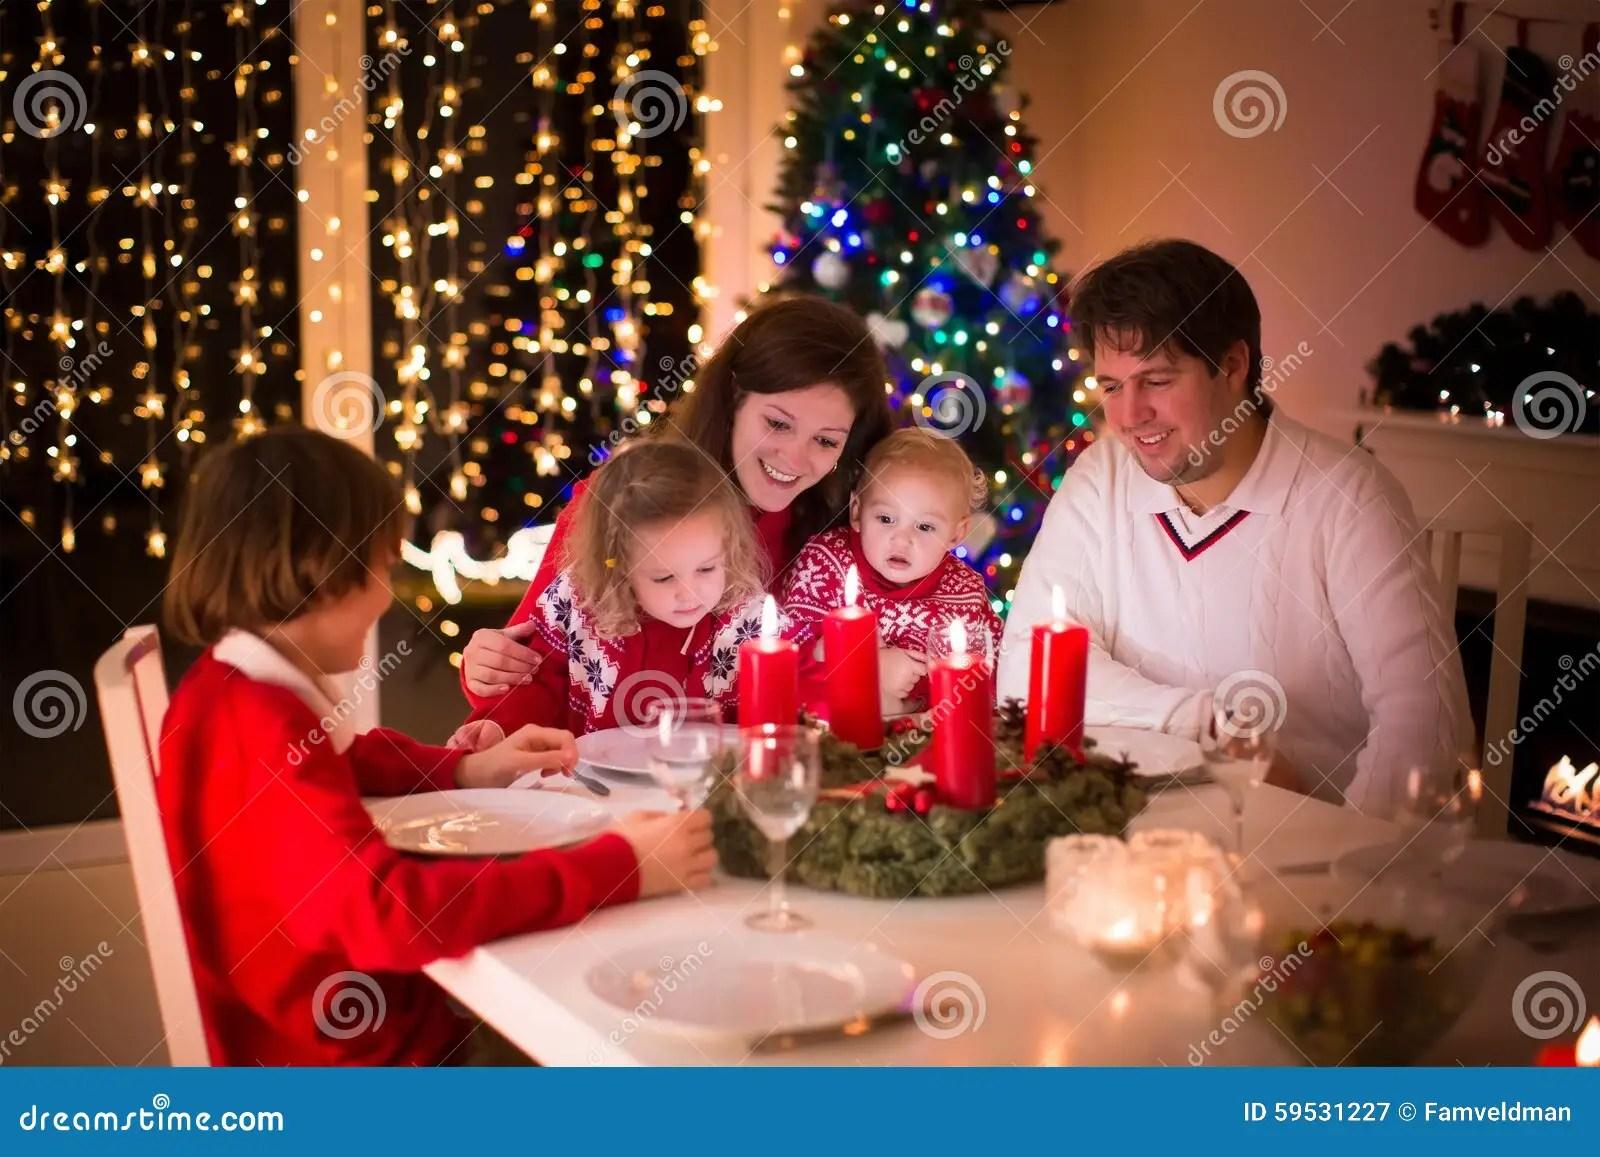 Family Enjoying Christmas Dinner At Home Stock Image  Image 59531227